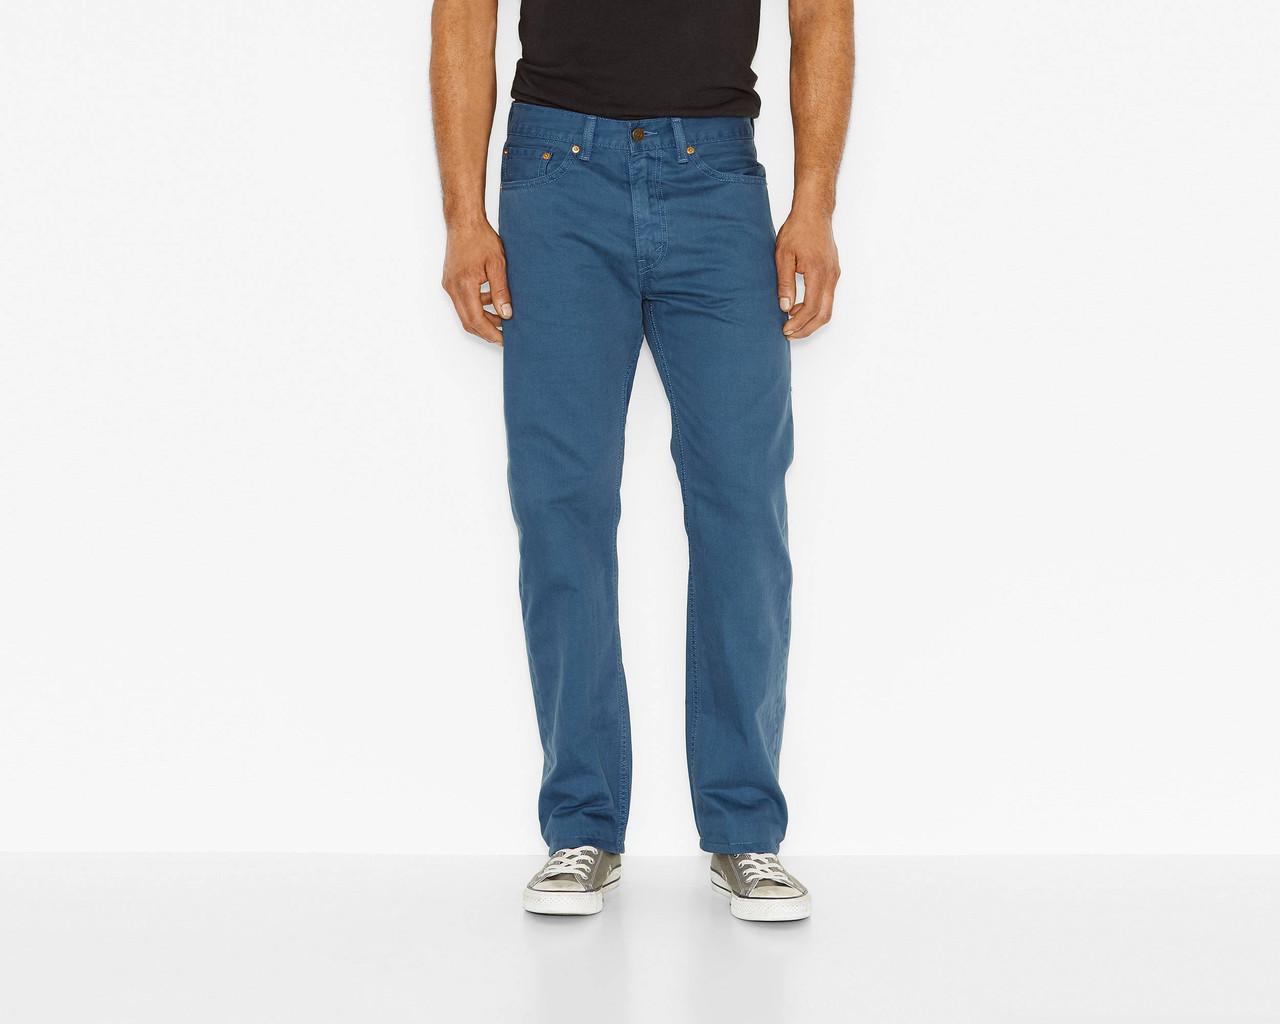 Джинсы Levi's 505 Regular Fit Pants, Ensign Blue, 34W29L, 005051259